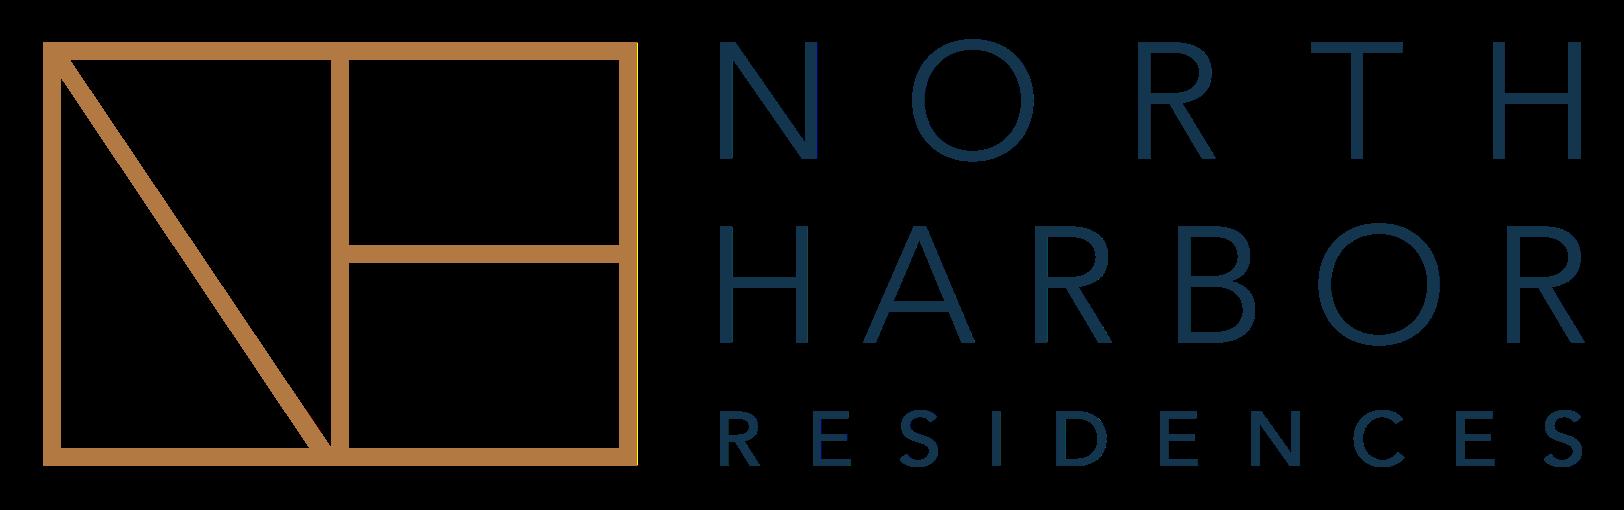 North Harbor Residences